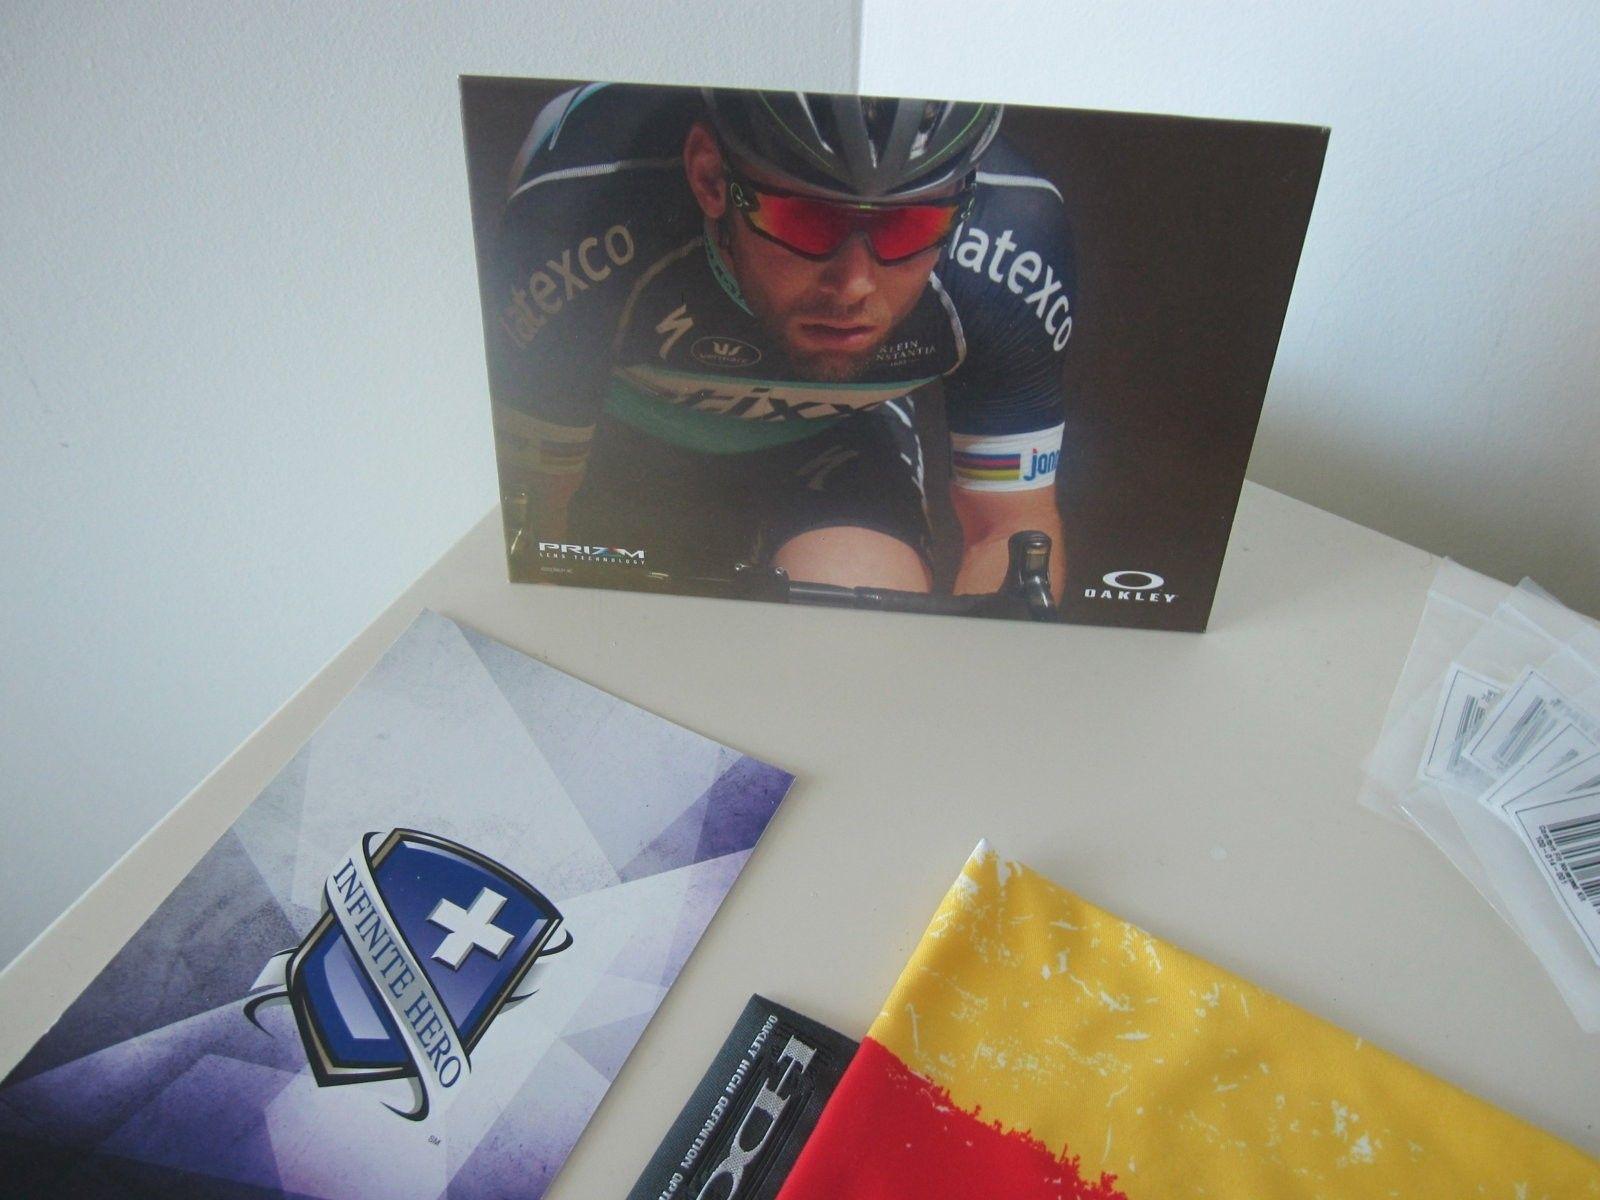 Oakley mini bundle - 2 frames and other stuff - GONE - IMG_5635.JPG